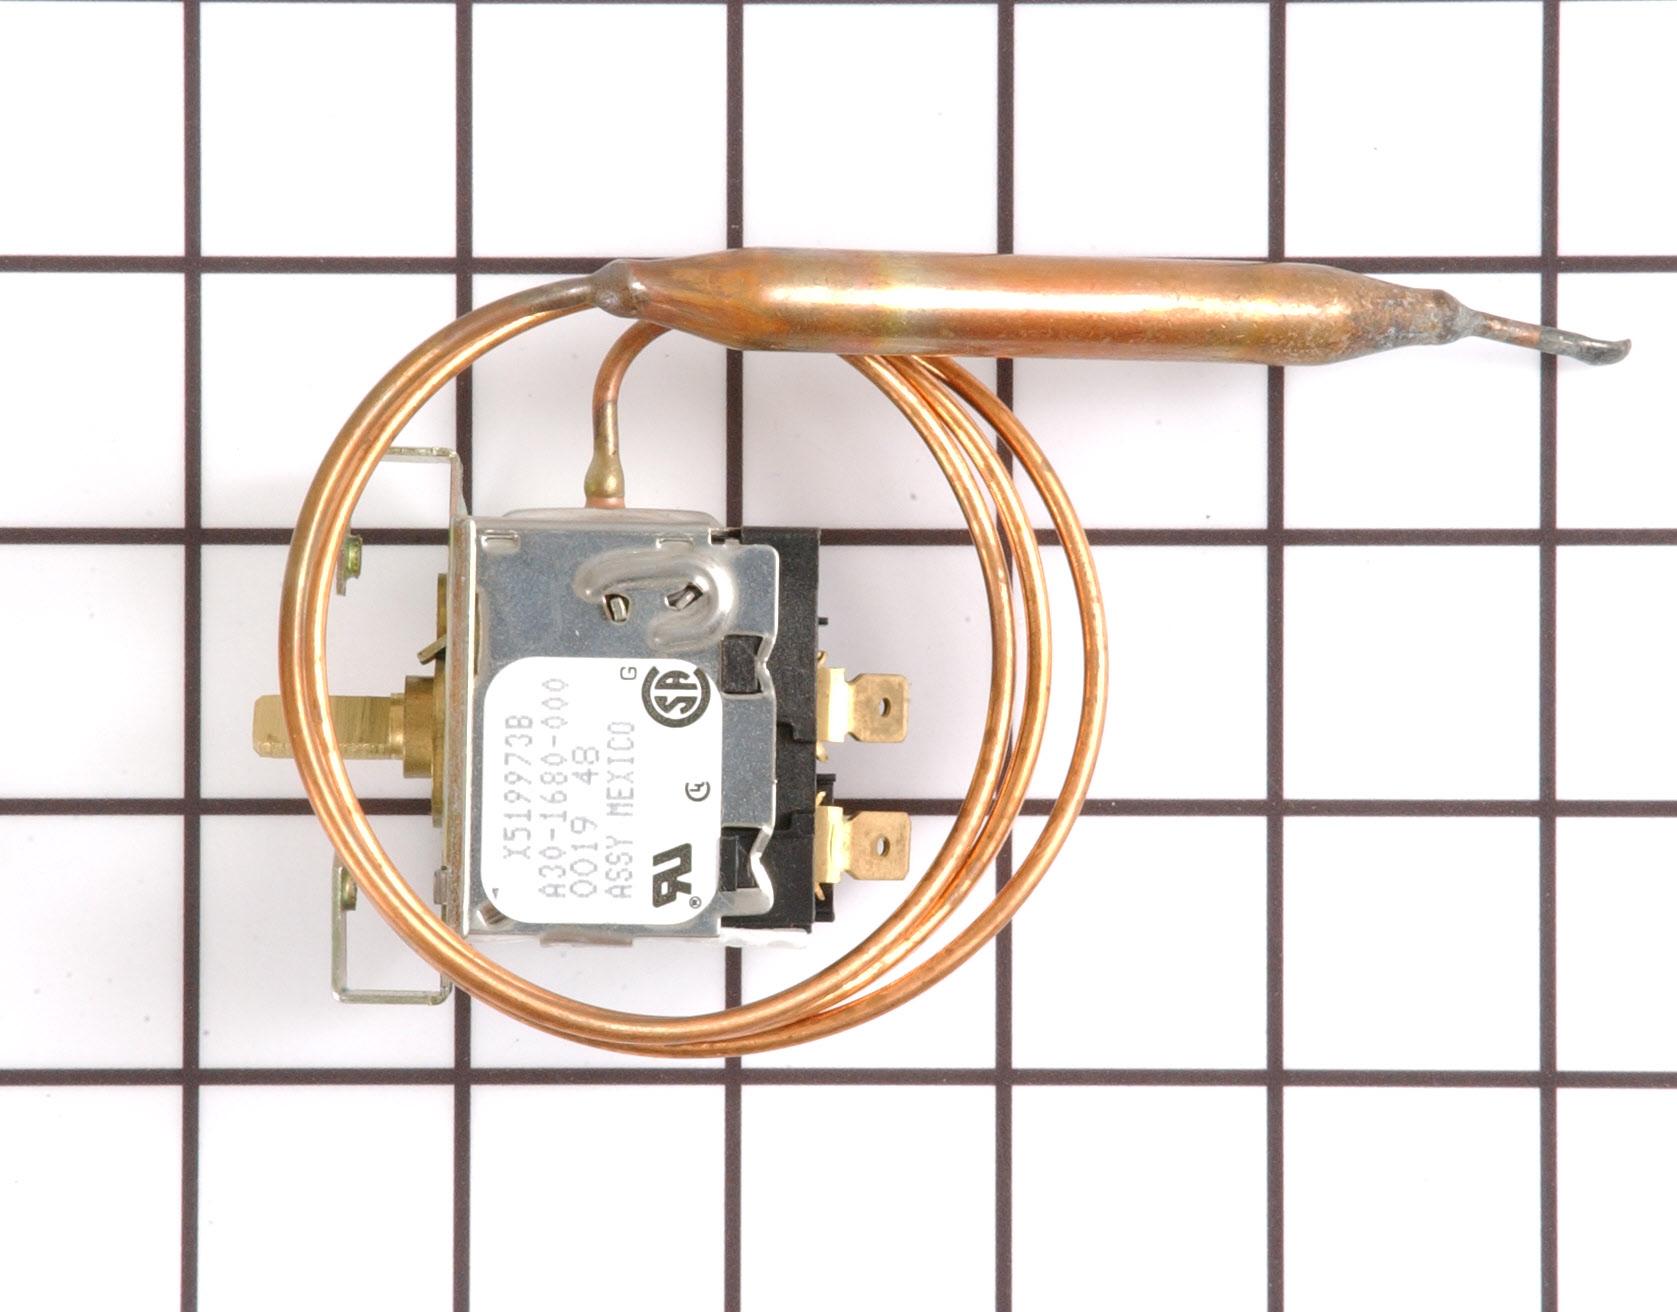 Kenmore Air Conditioner Part # 5300519973 - Temperature Control Thermostat